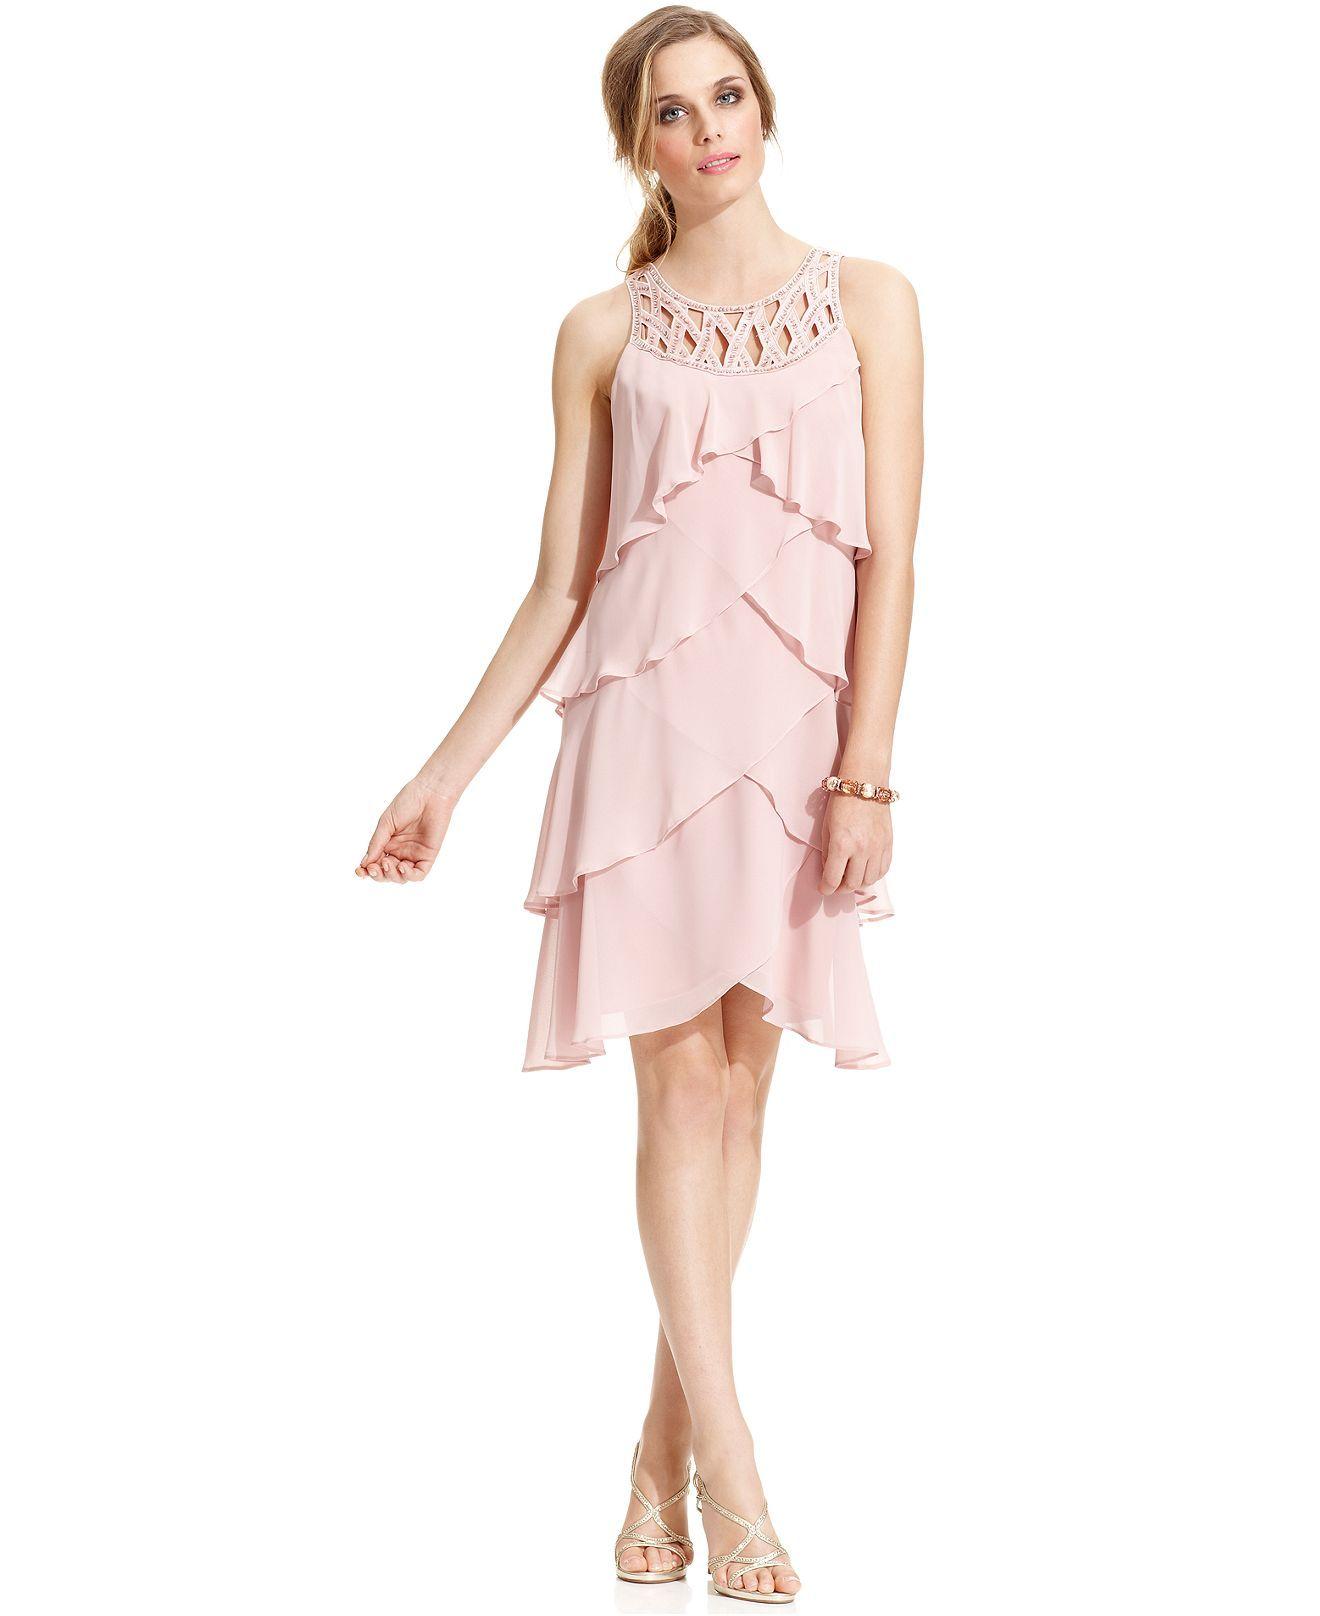 Sl sl fashion dresses - Sl Fashions Dress Sleeveless Petal Tiered Beaded Dresses Women Macy S